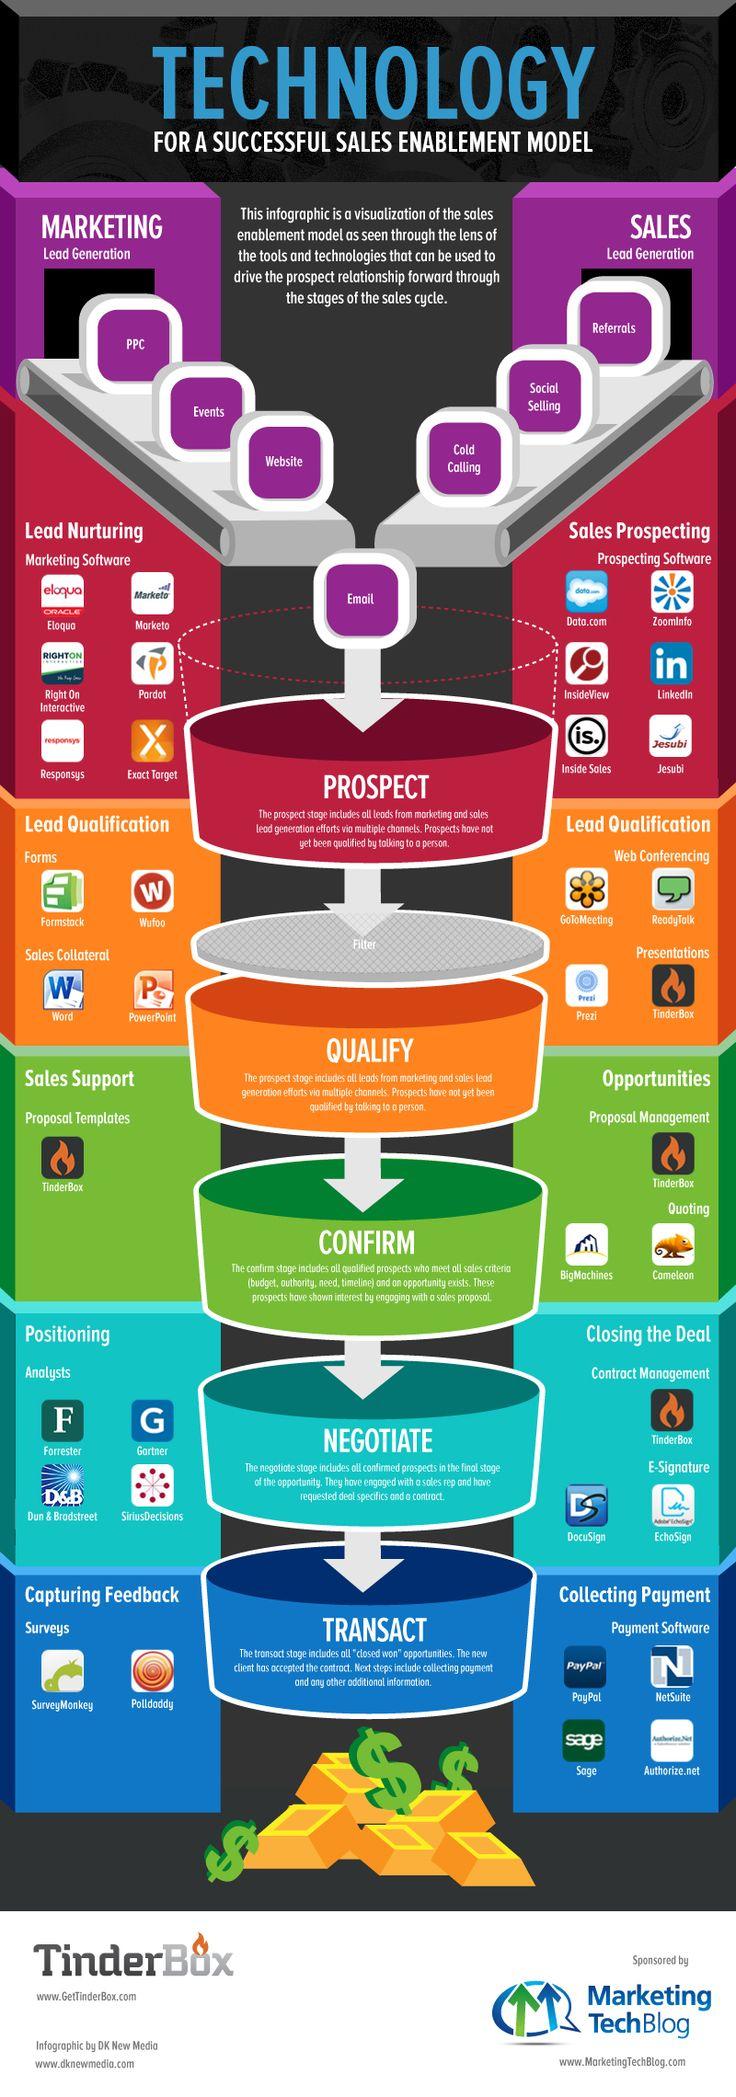 98 best Sales Enablement images on Pinterest | Digital marketing ...